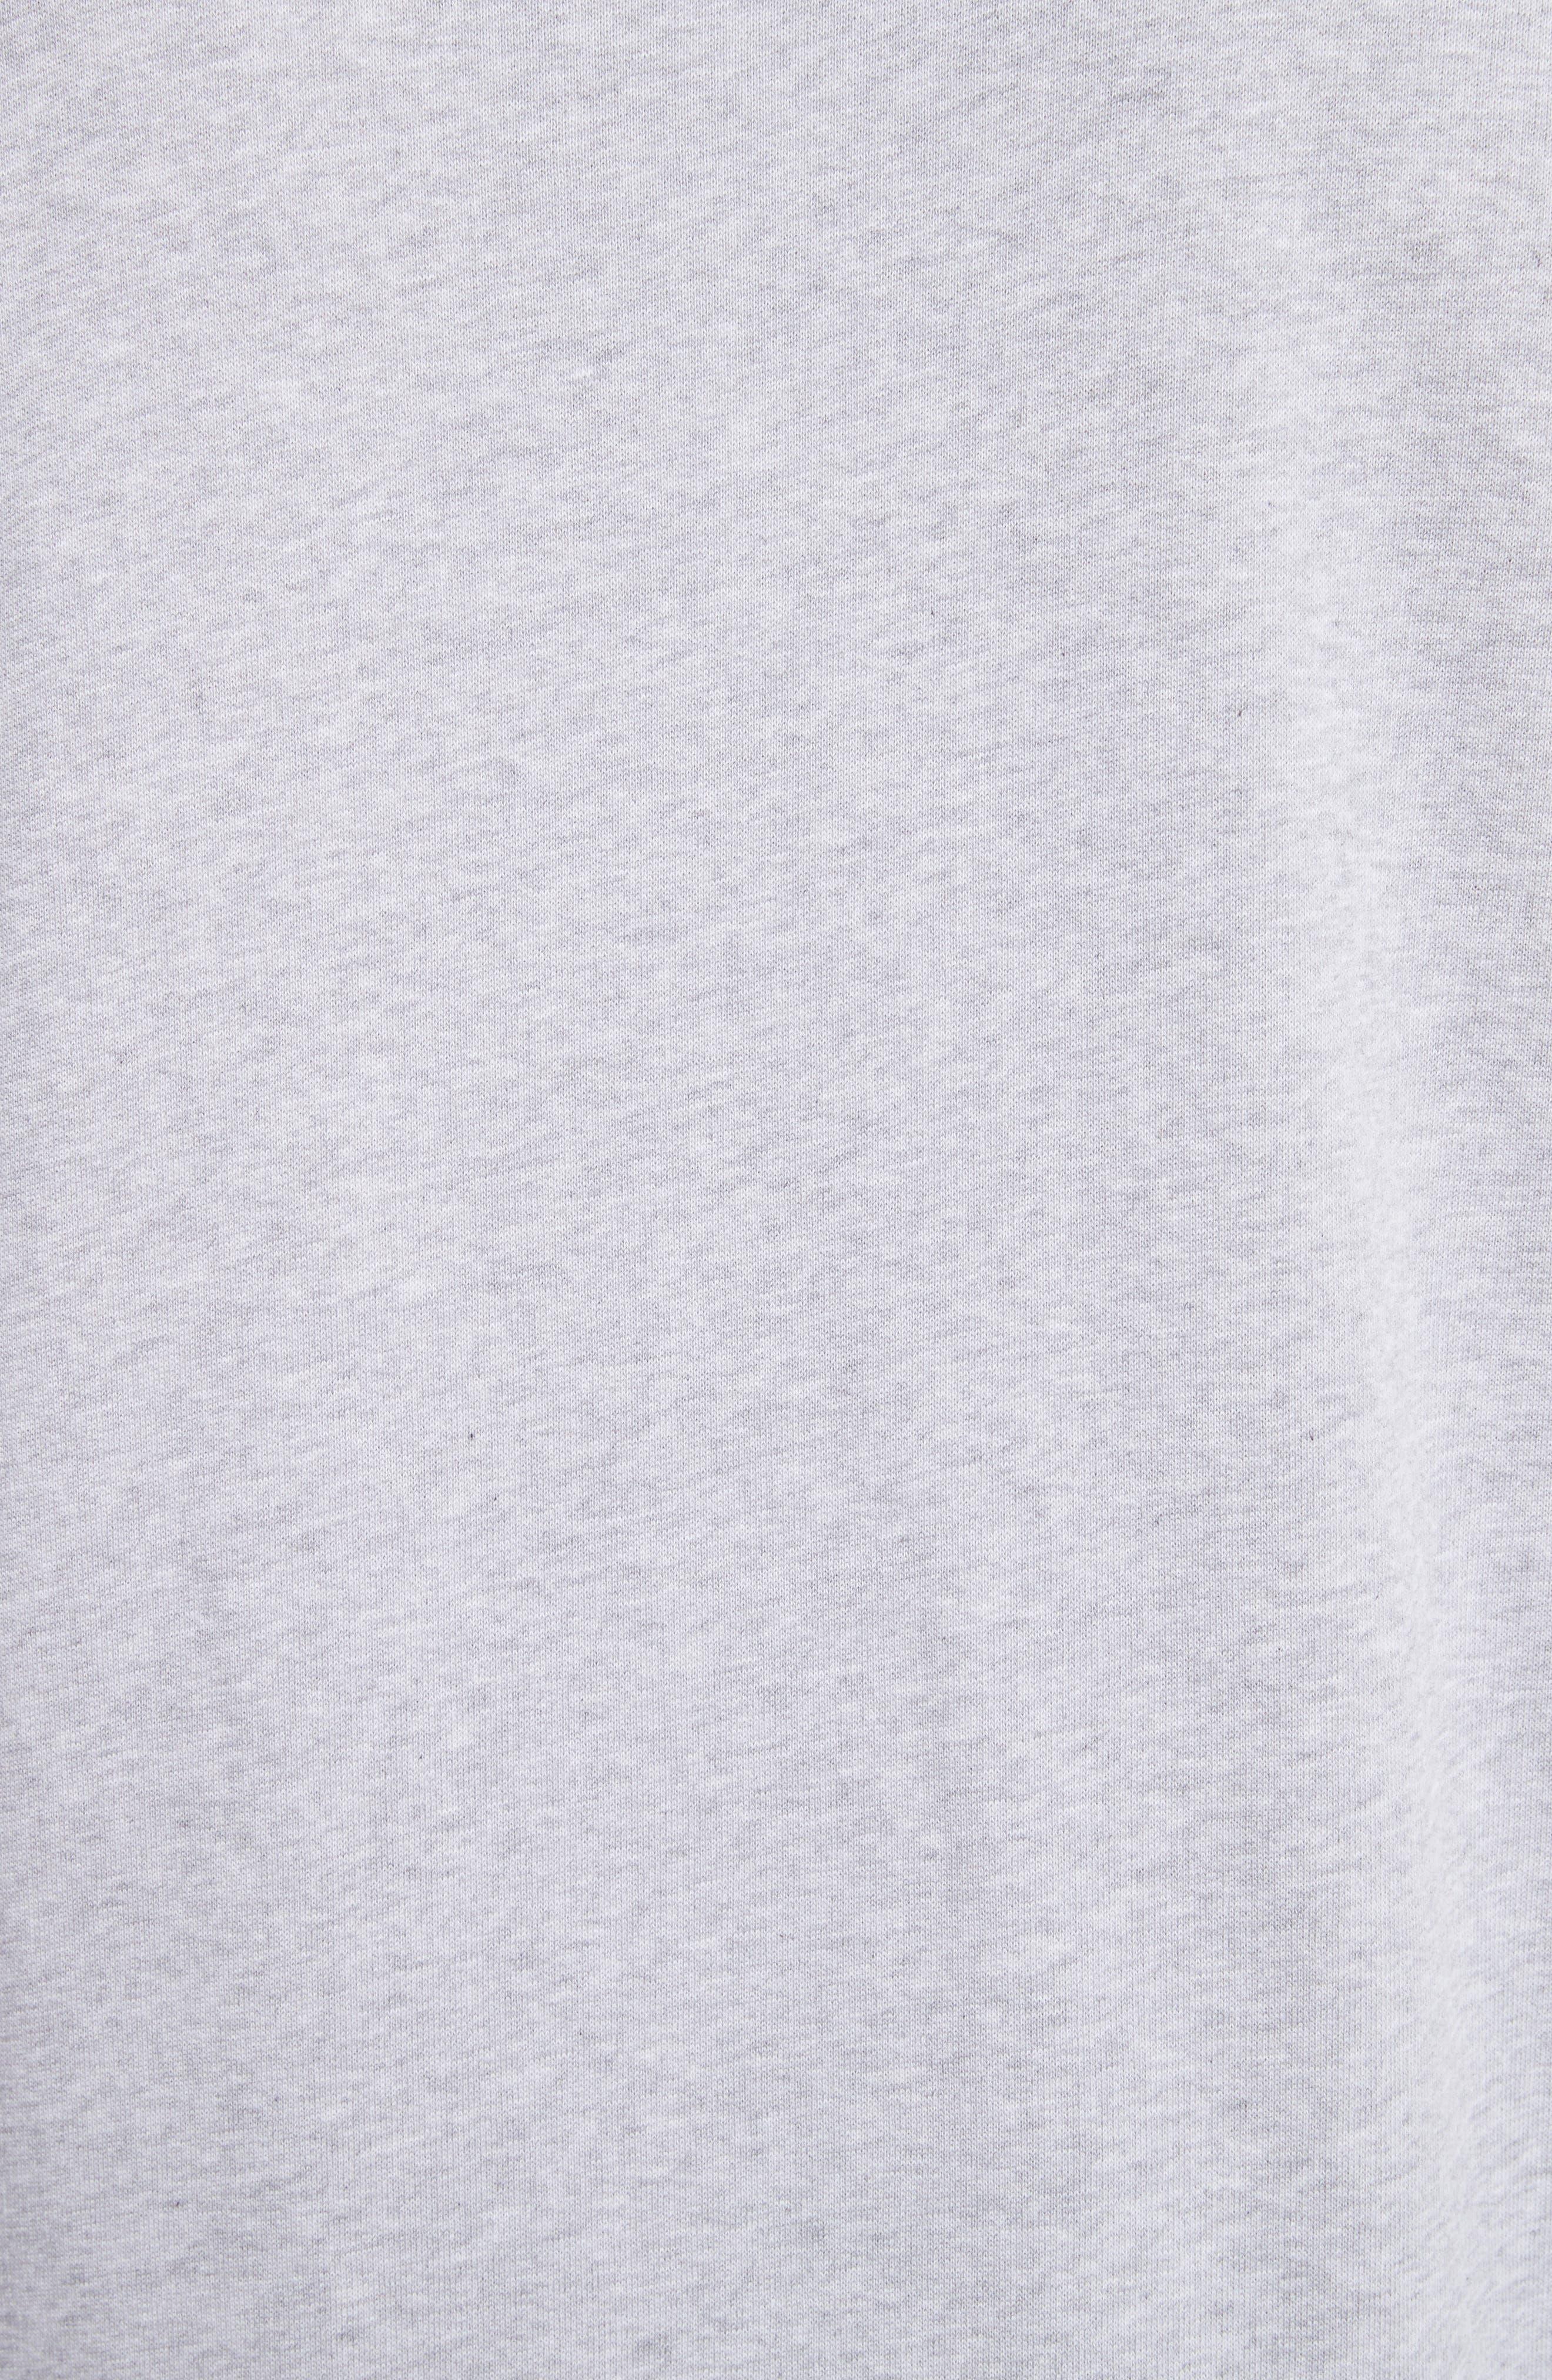 VERSUS by Versace Zip Sleeve Crewneck Sweatshirt,                             Alternate thumbnail 5, color,                             Grey